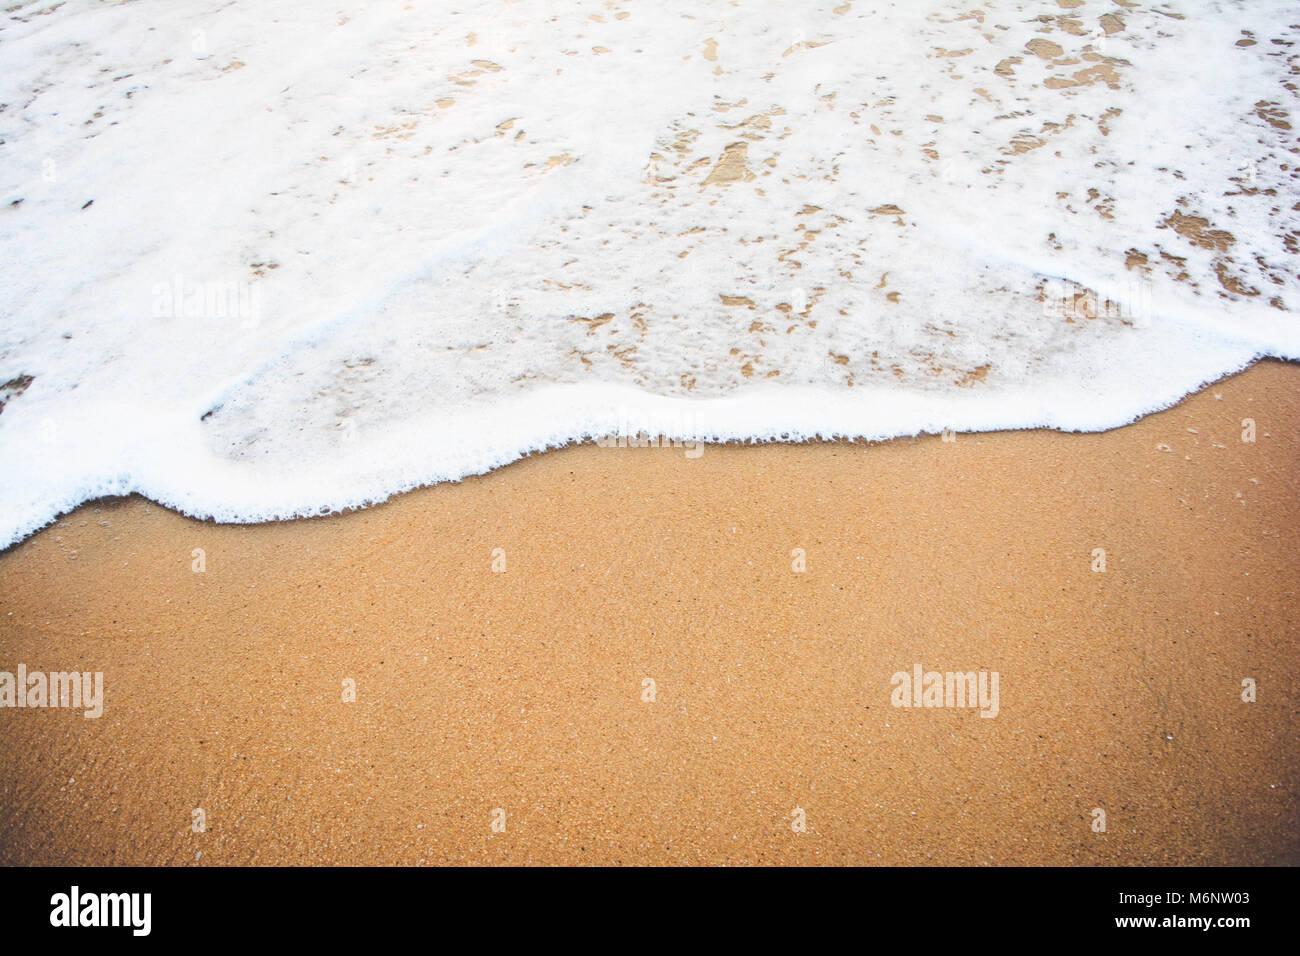 ocean wave on sandy beach - Stock Image